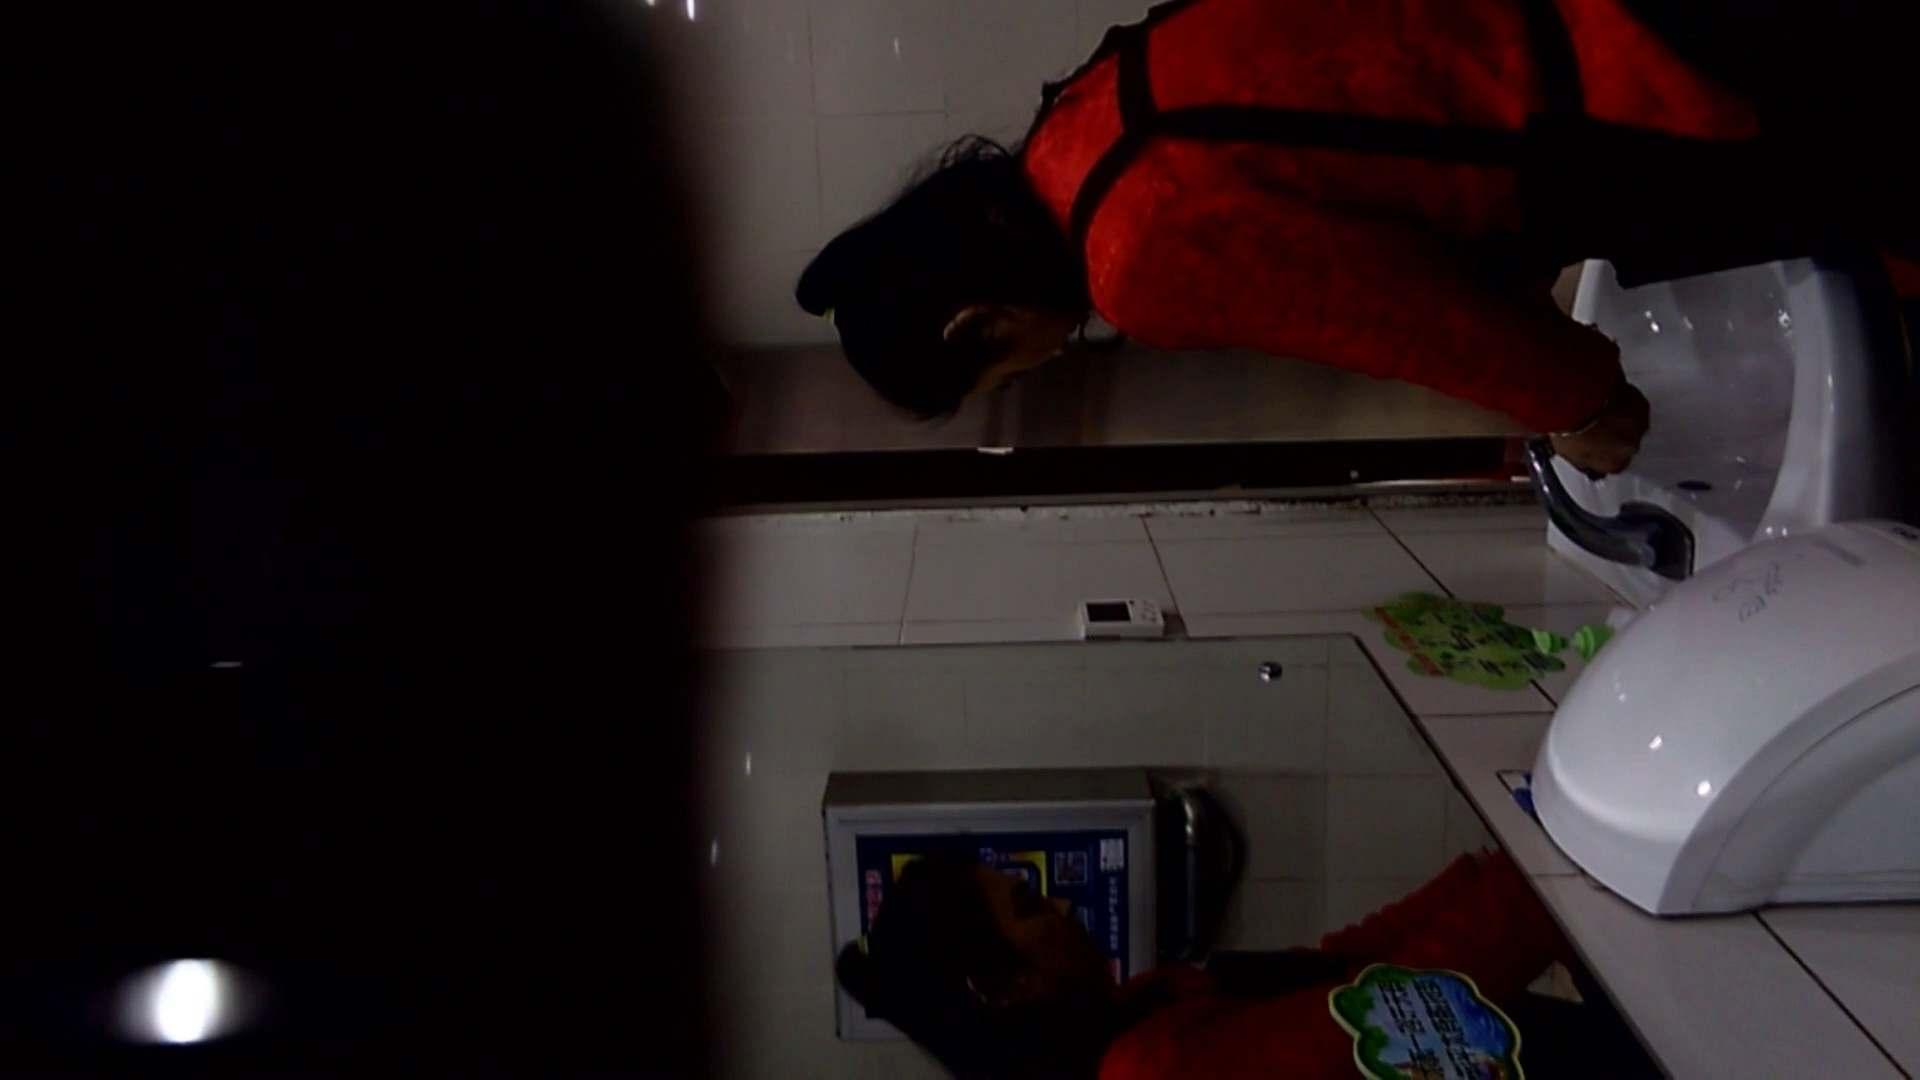 芸術大学ガチ潜入盗撮 JD盗撮 美女の洗面所の秘密 Vol.105 丸見え  100PIX 89